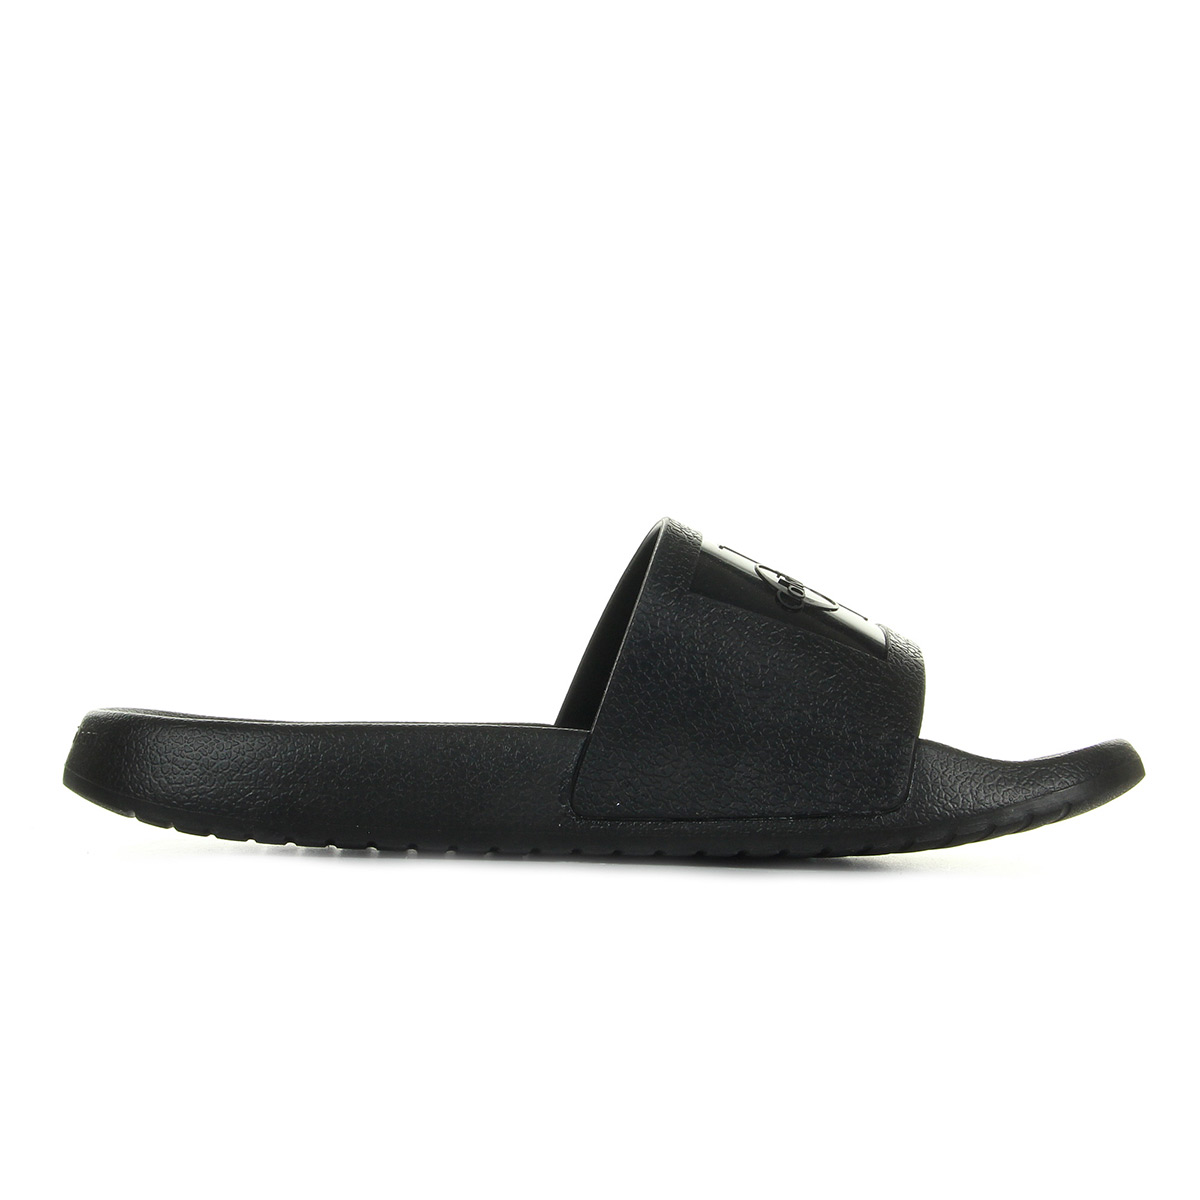 Sandales Calvin Klein Jeans Christie Jelly - R8837blk Nike Chaussures de football Hypervenomx Phelon Iii IC M Nike 0kJCgqIczP